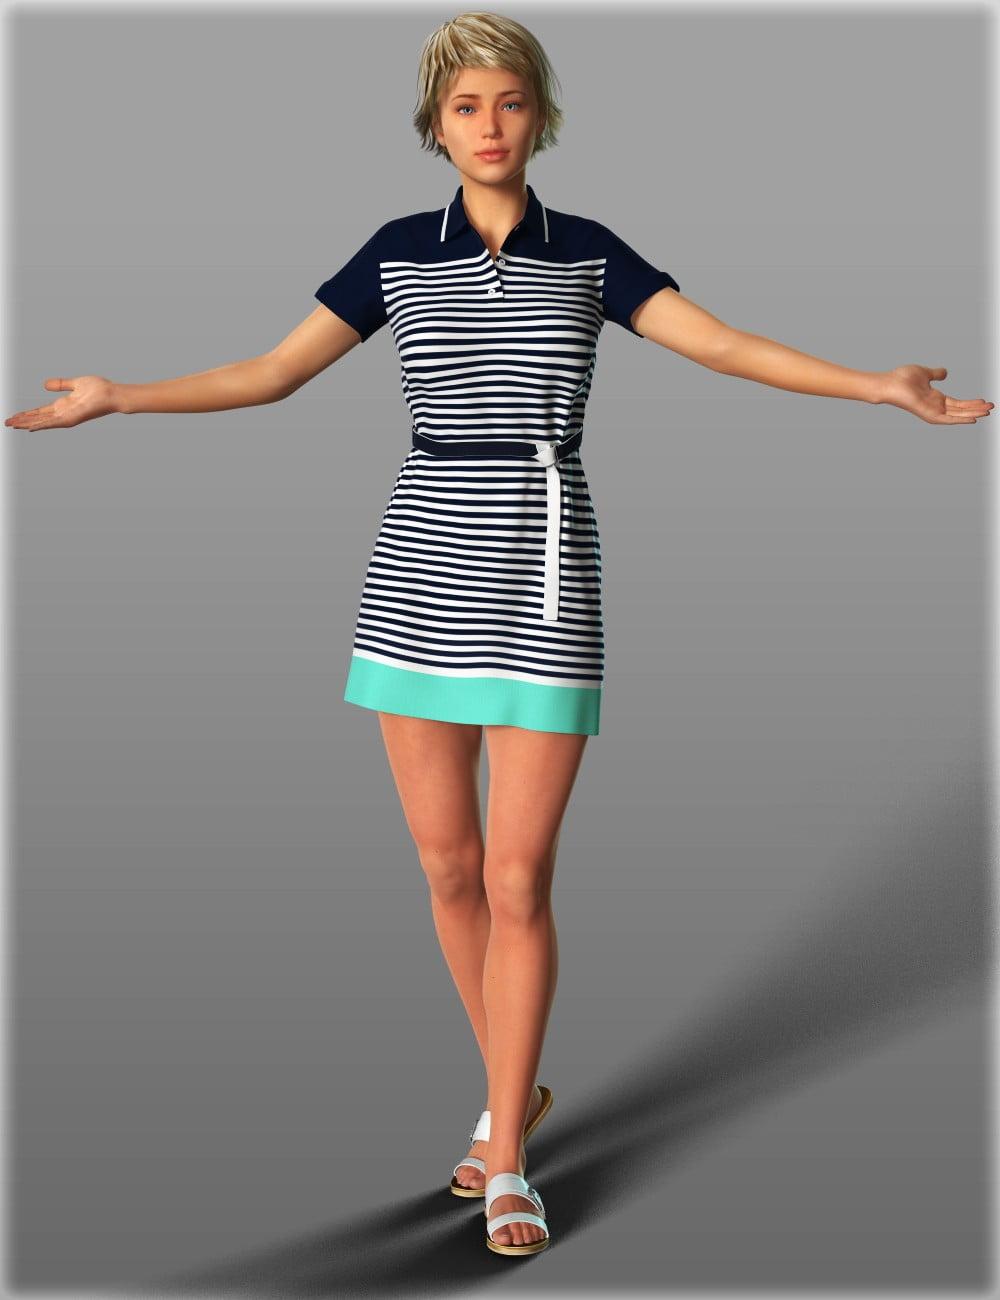 03-short-sleeve-shirt-dress-for-genesis-2-females-daz3d